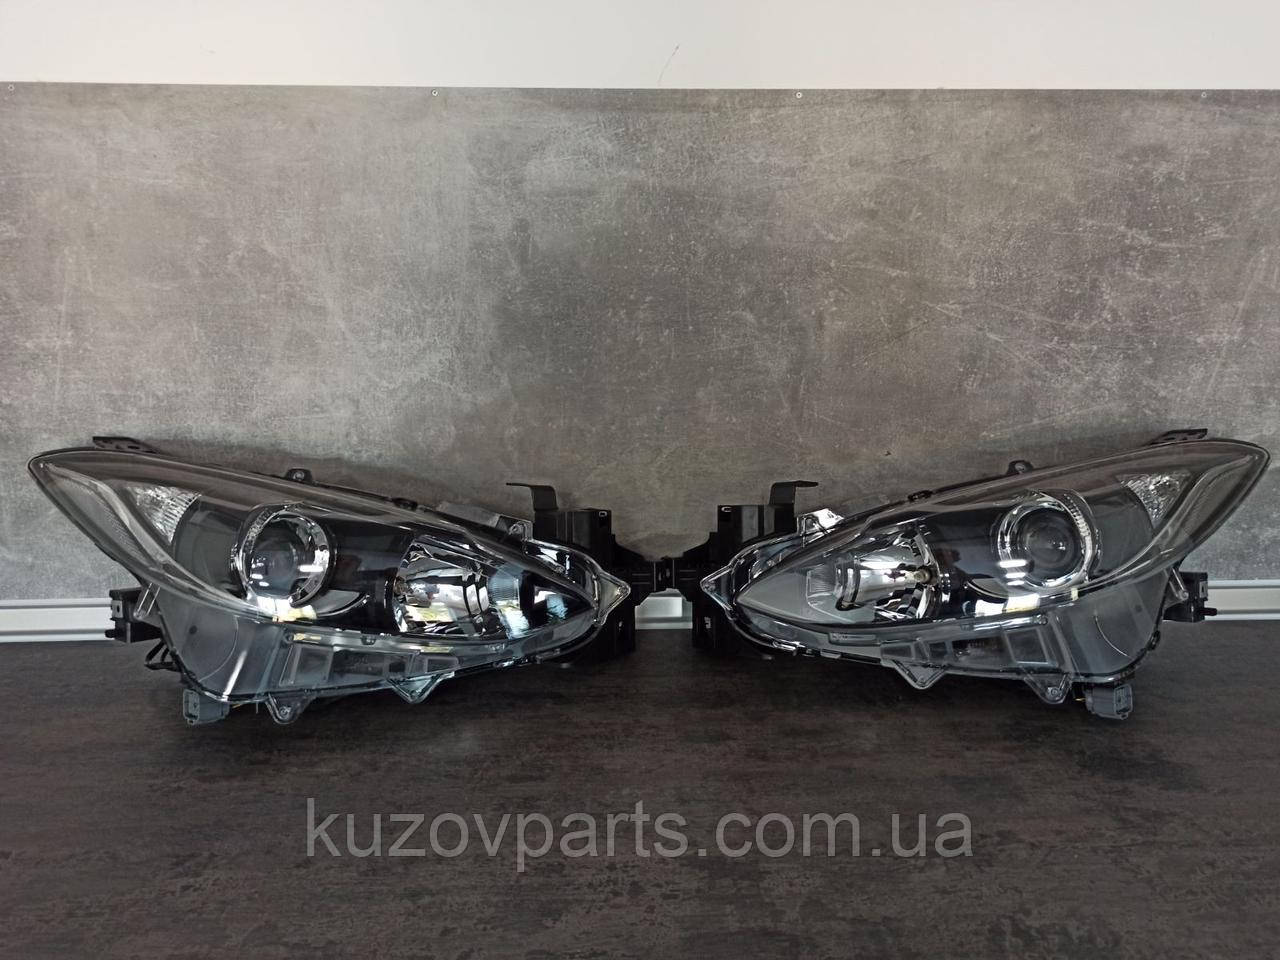 Фара передняя правая левая Mazda 3 2014 2015 2016